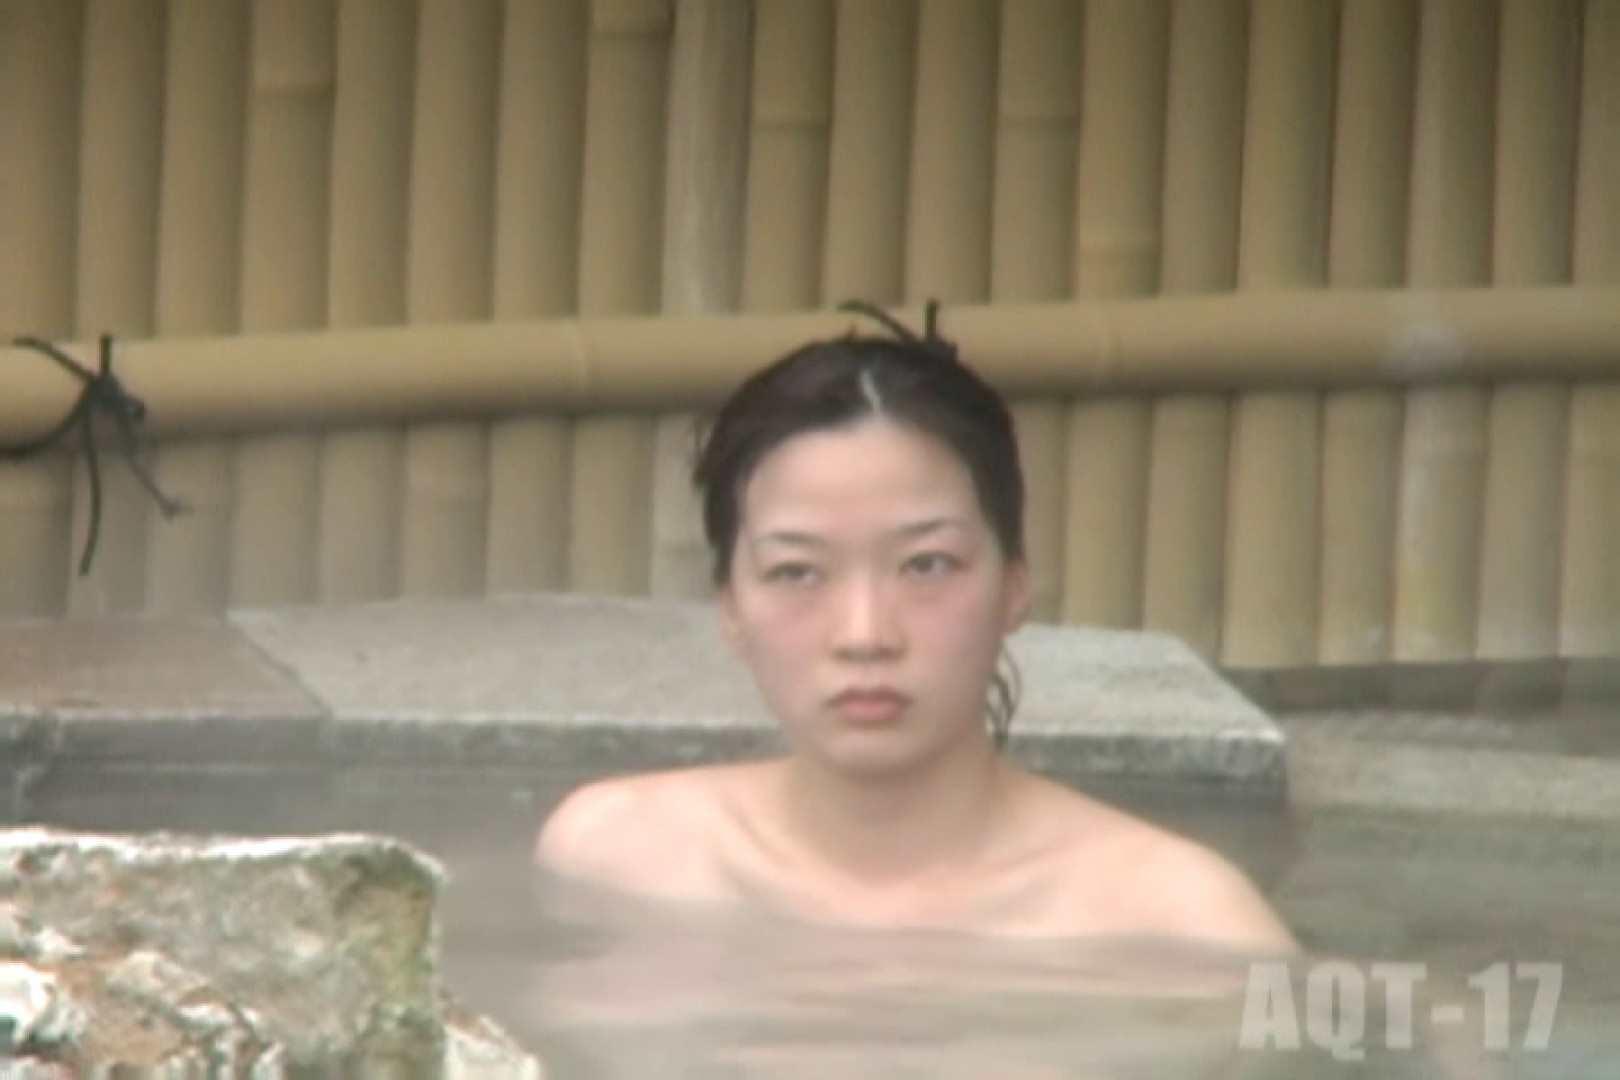 Aquaな露天風呂Vol.848 盗撮特撮 | OLのプライベート  12pic 1